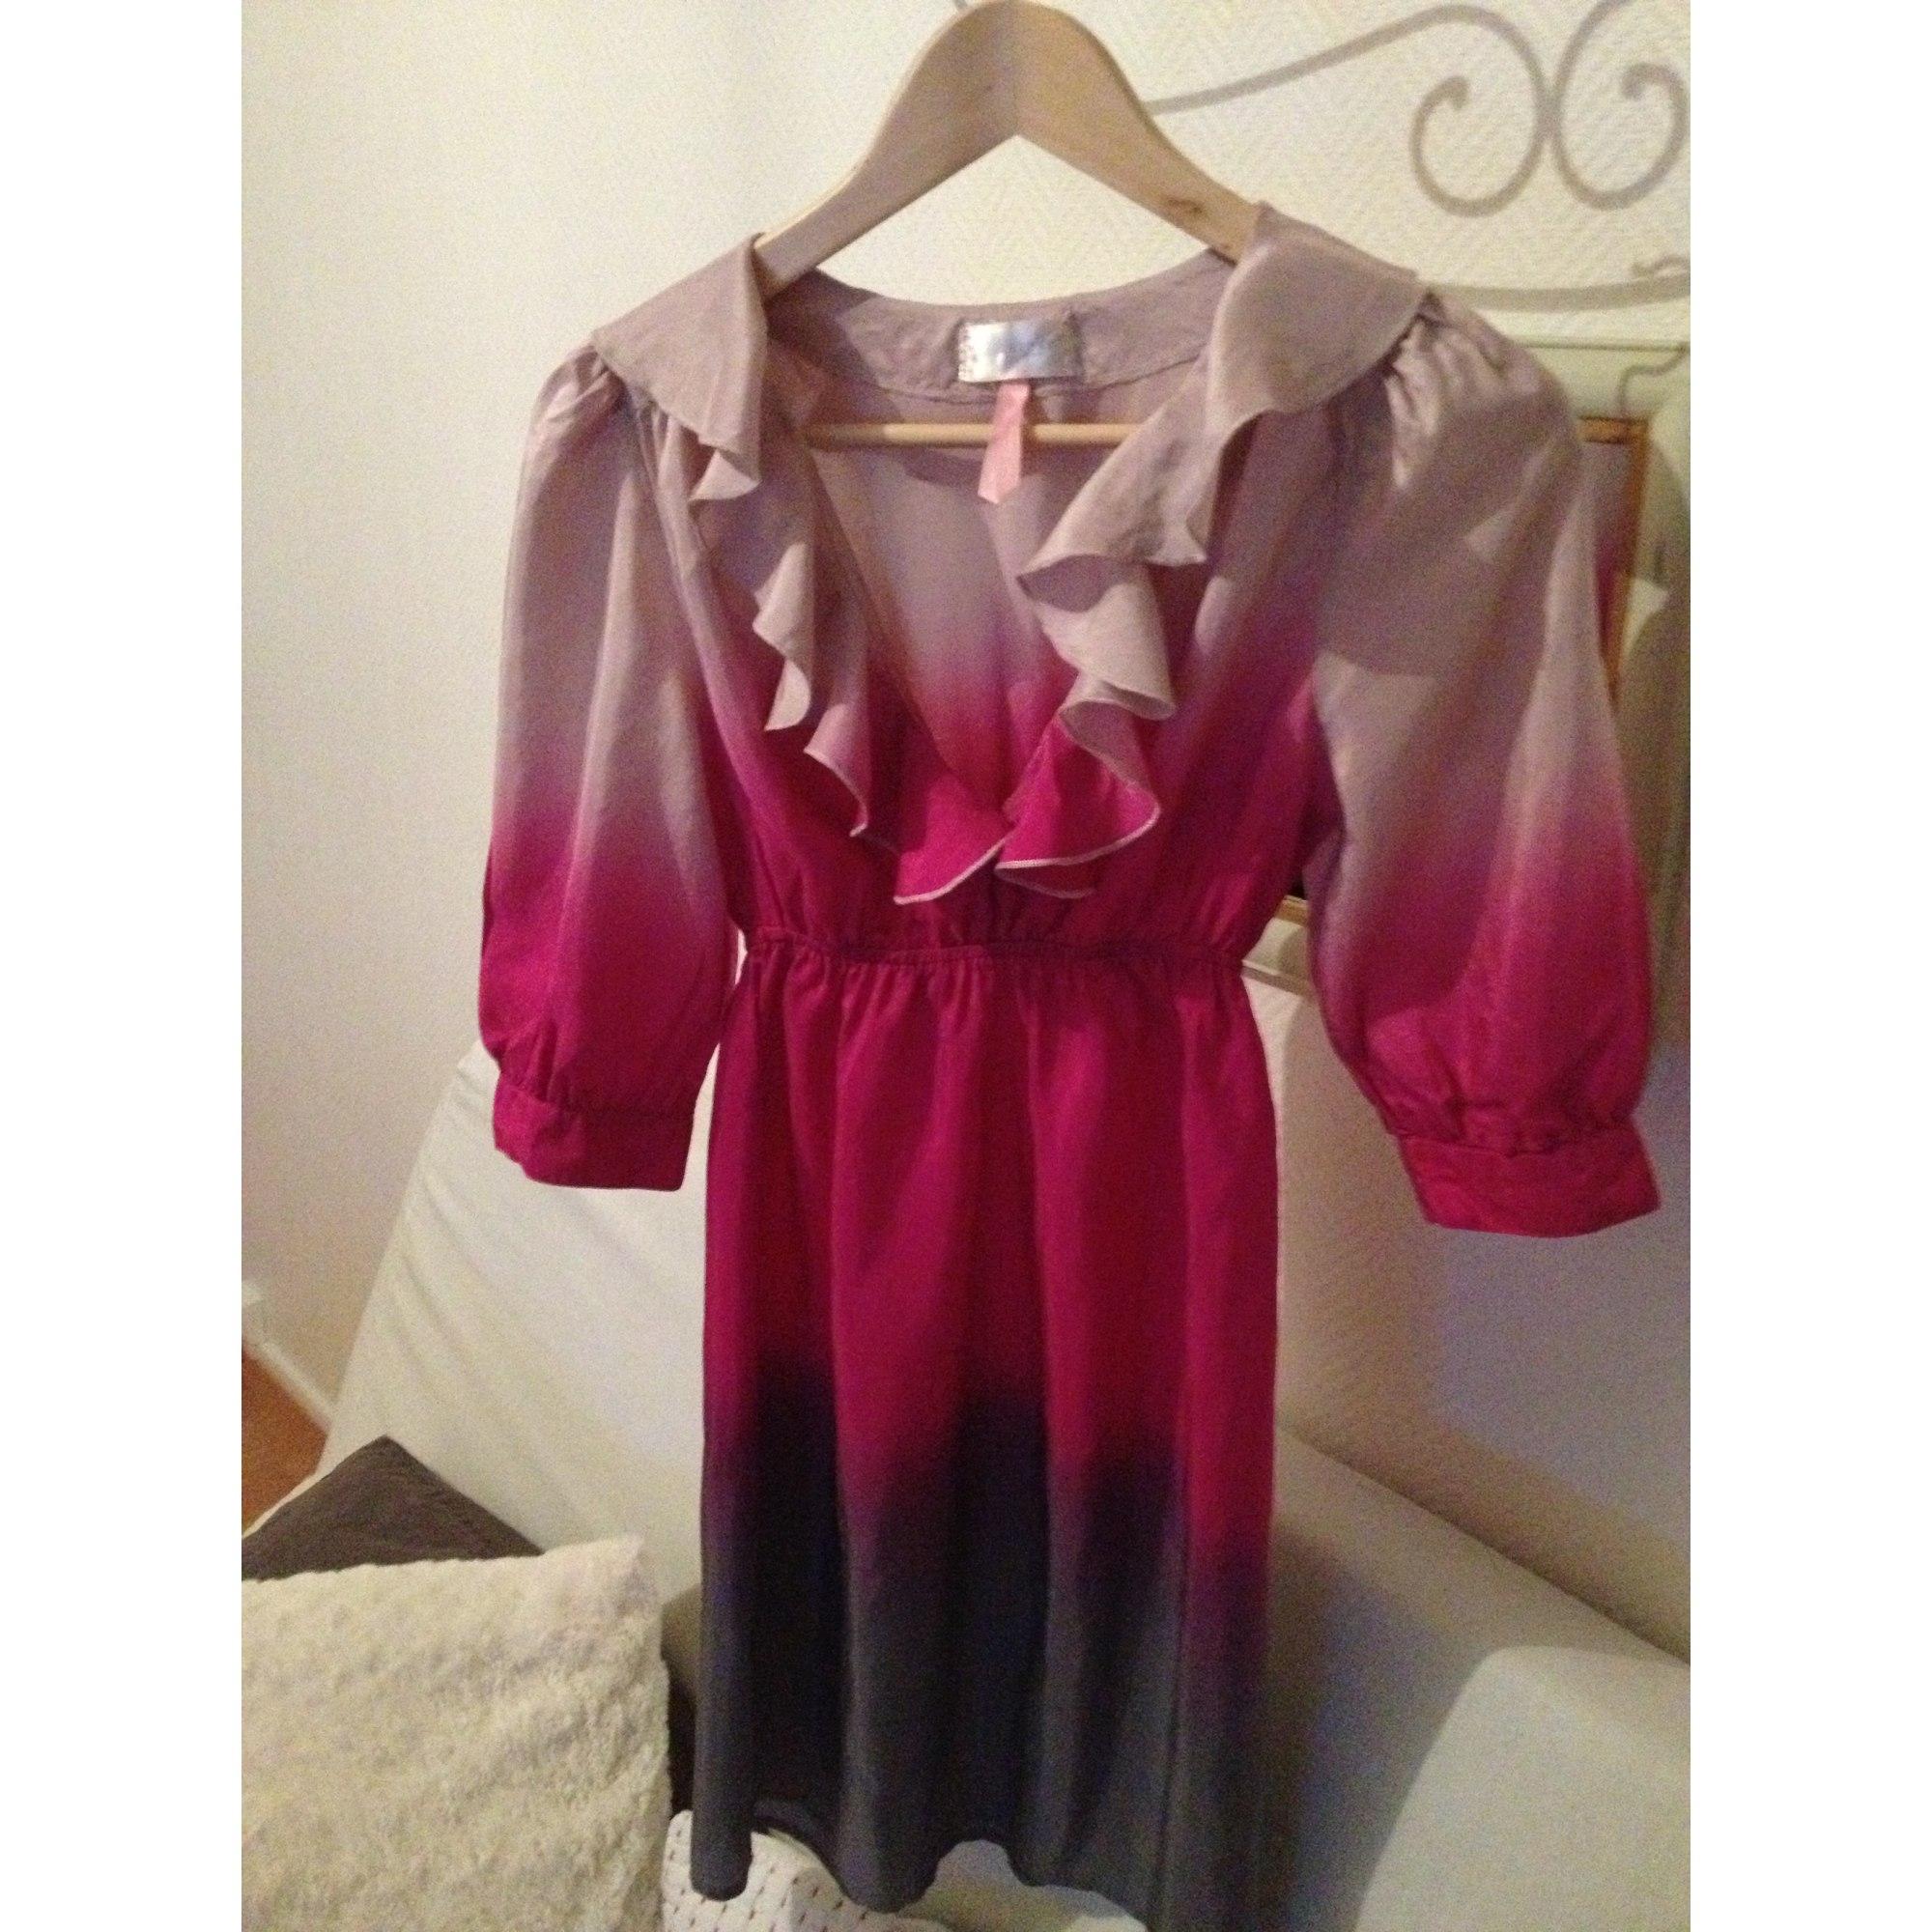 Robe courte LIPSY Rose, fuschia, vieux rose